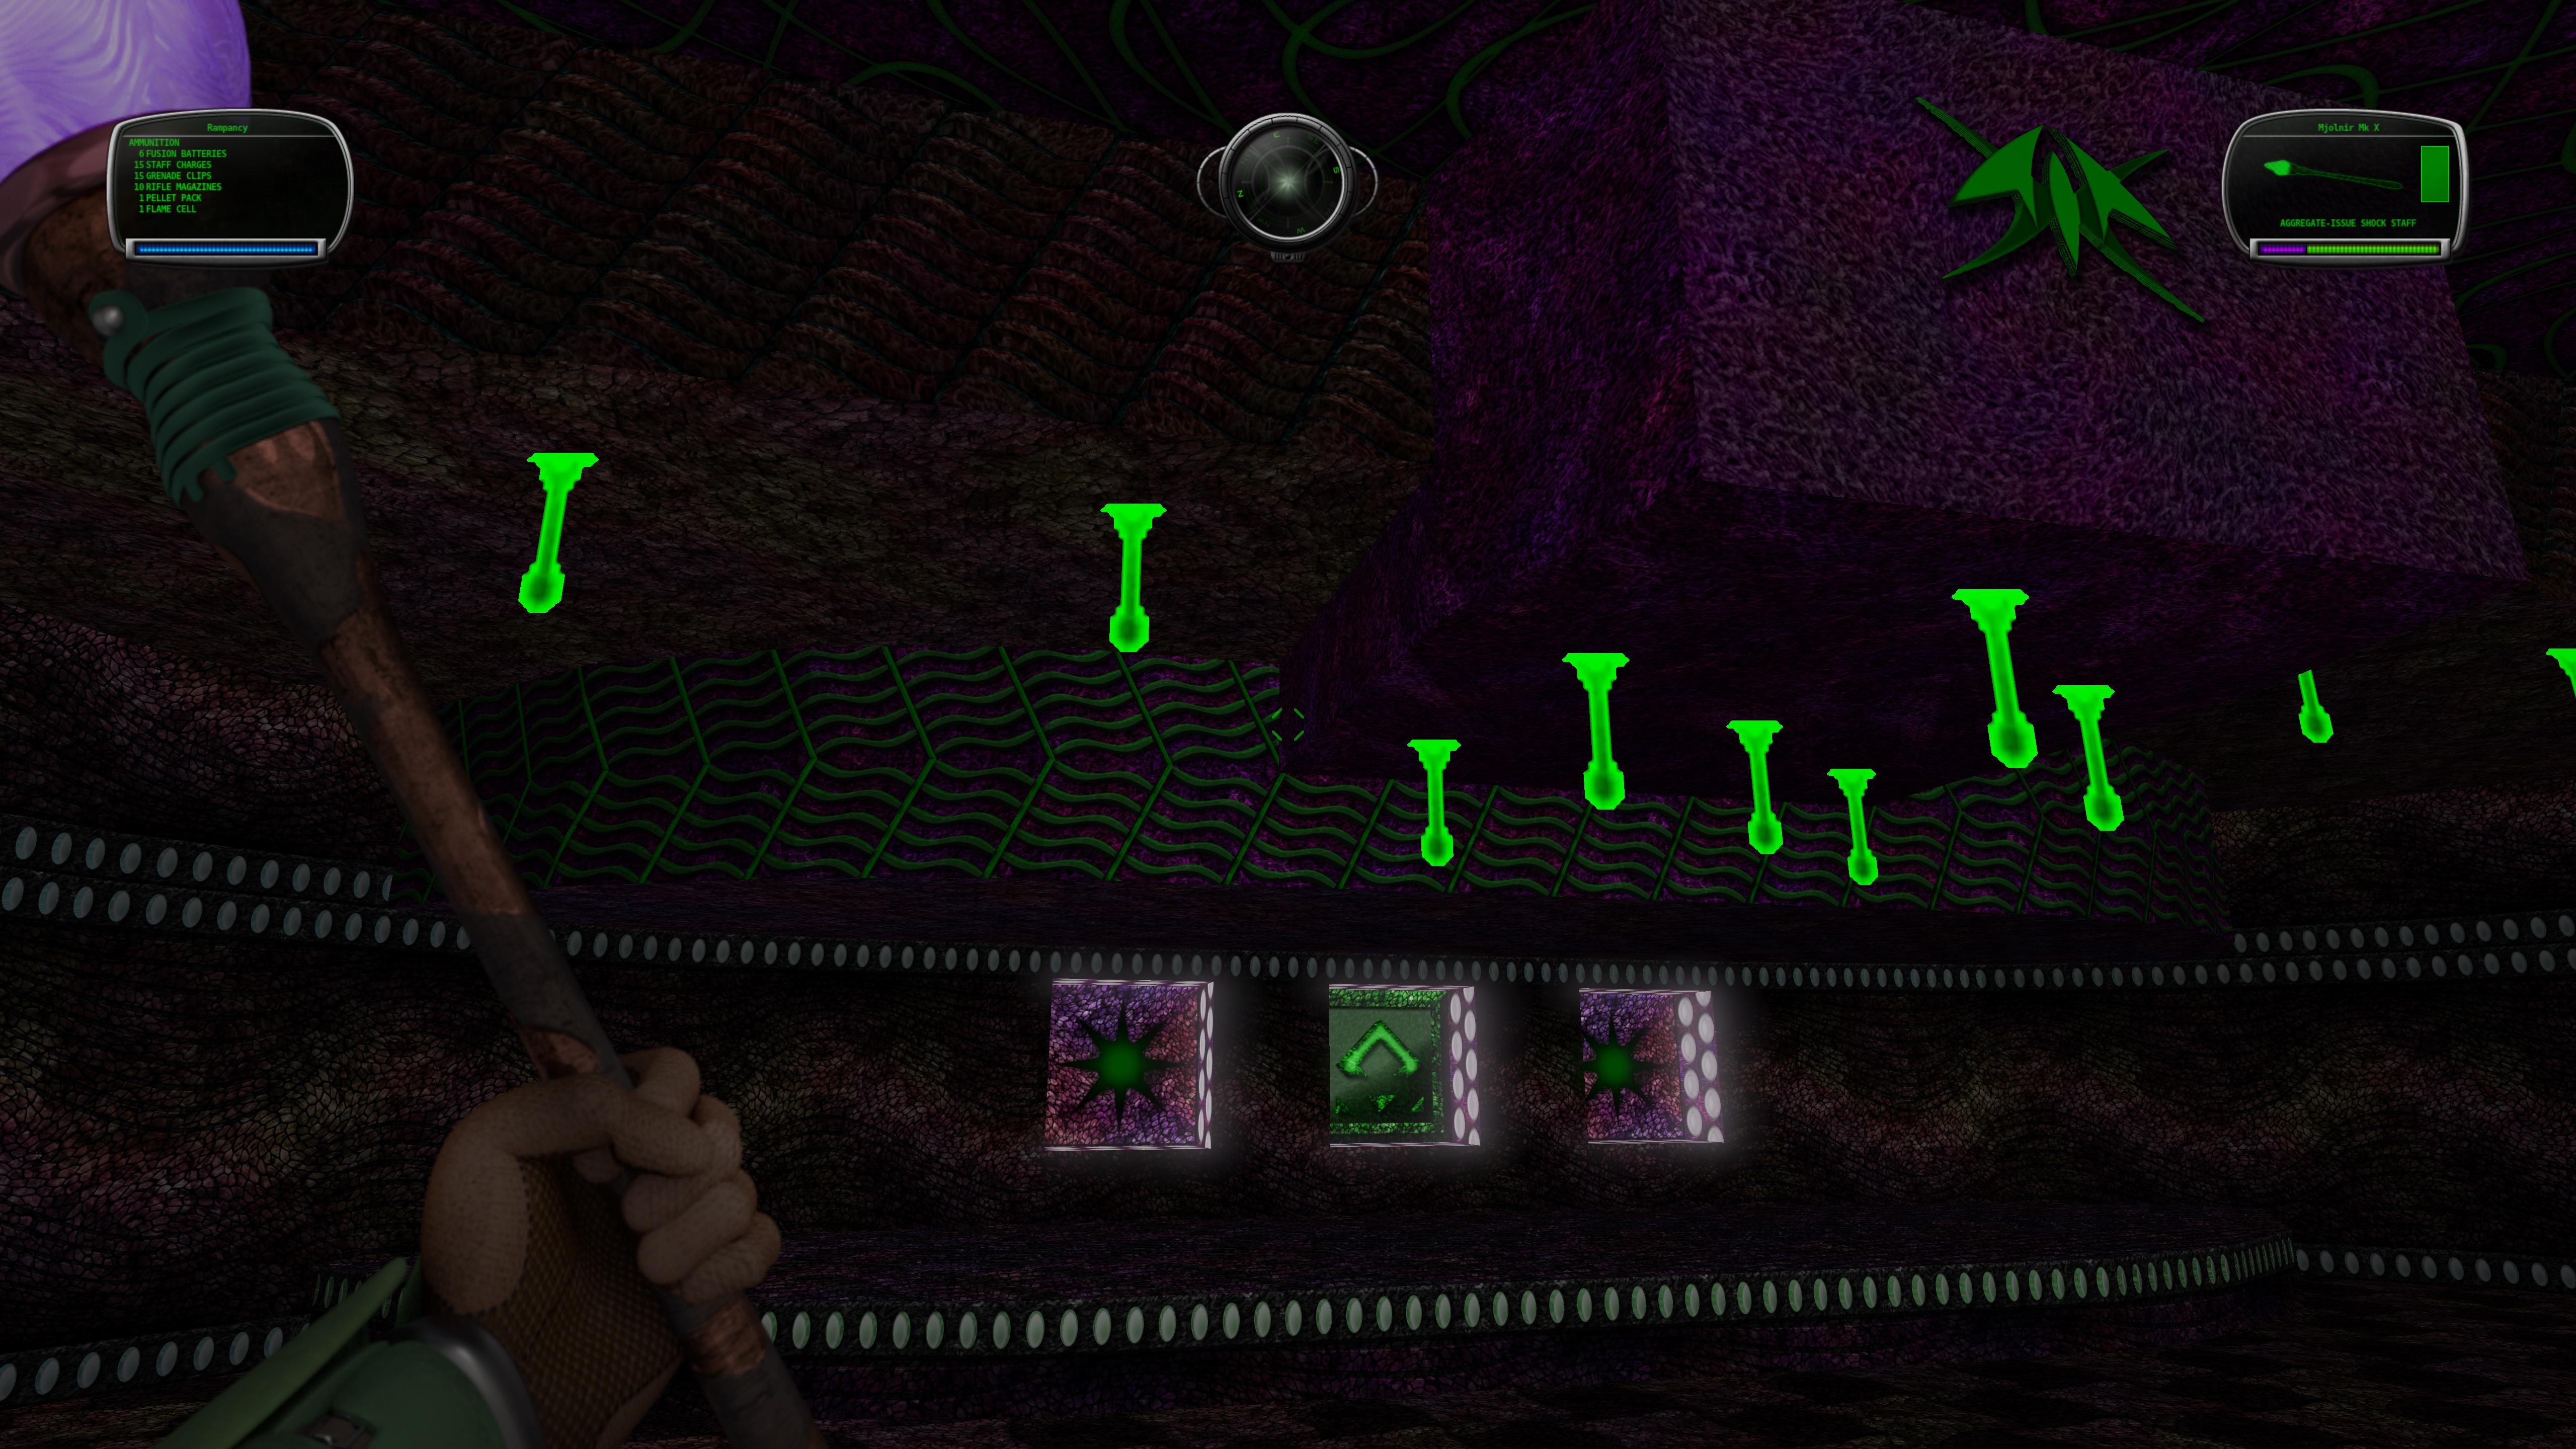 <i>Eternal</i> level 35 screenshot 2